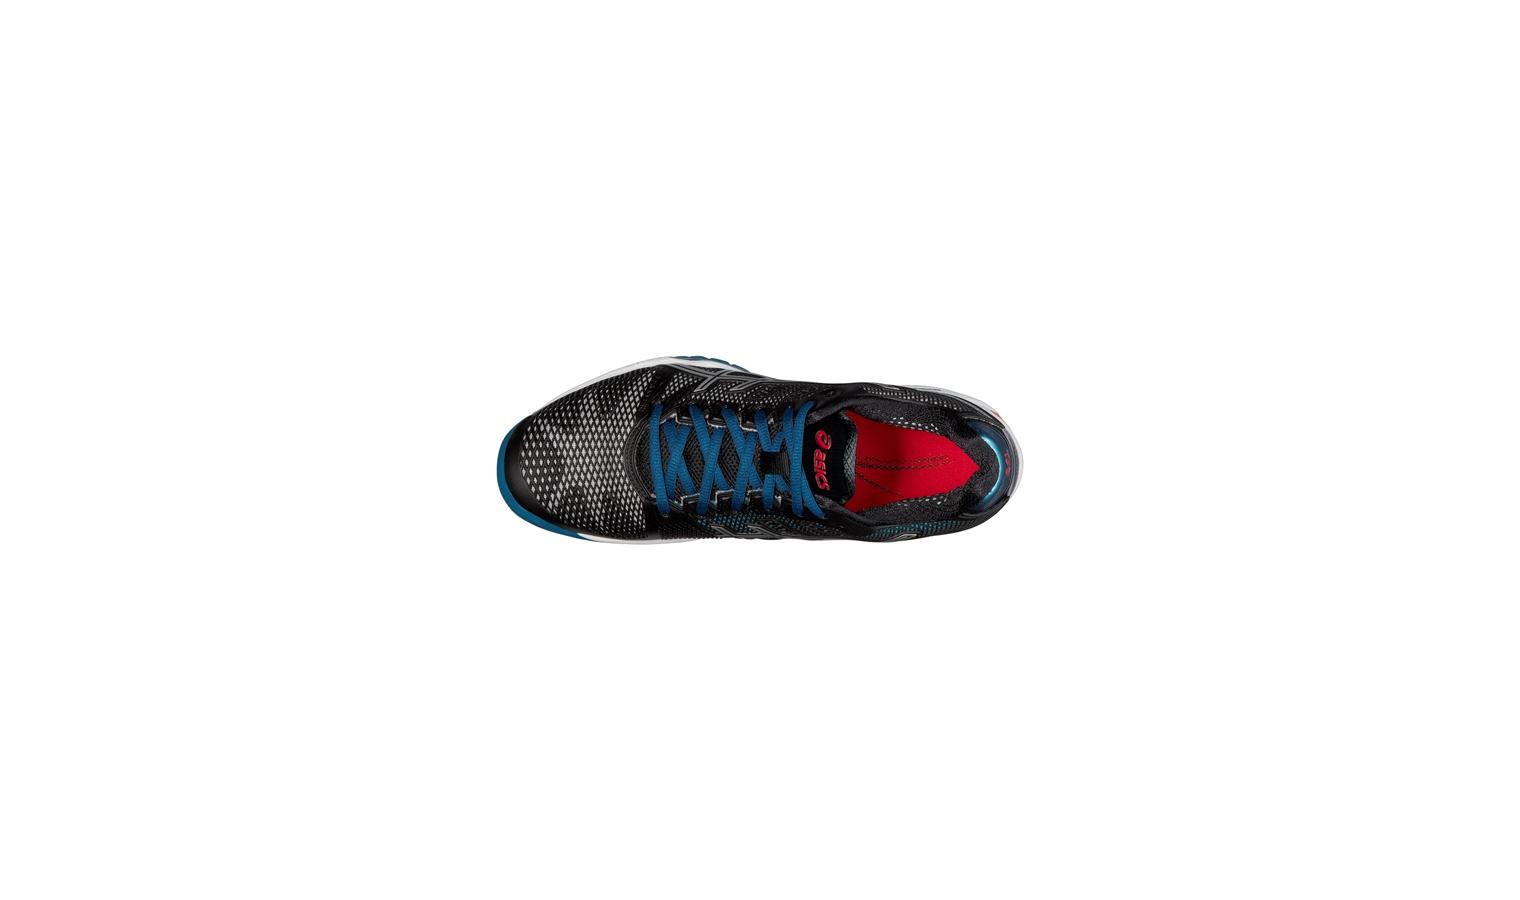 Pánské tenisové boty Asics GEL-SOLUTION SPEED 2 CLAY černé  b3878ab297